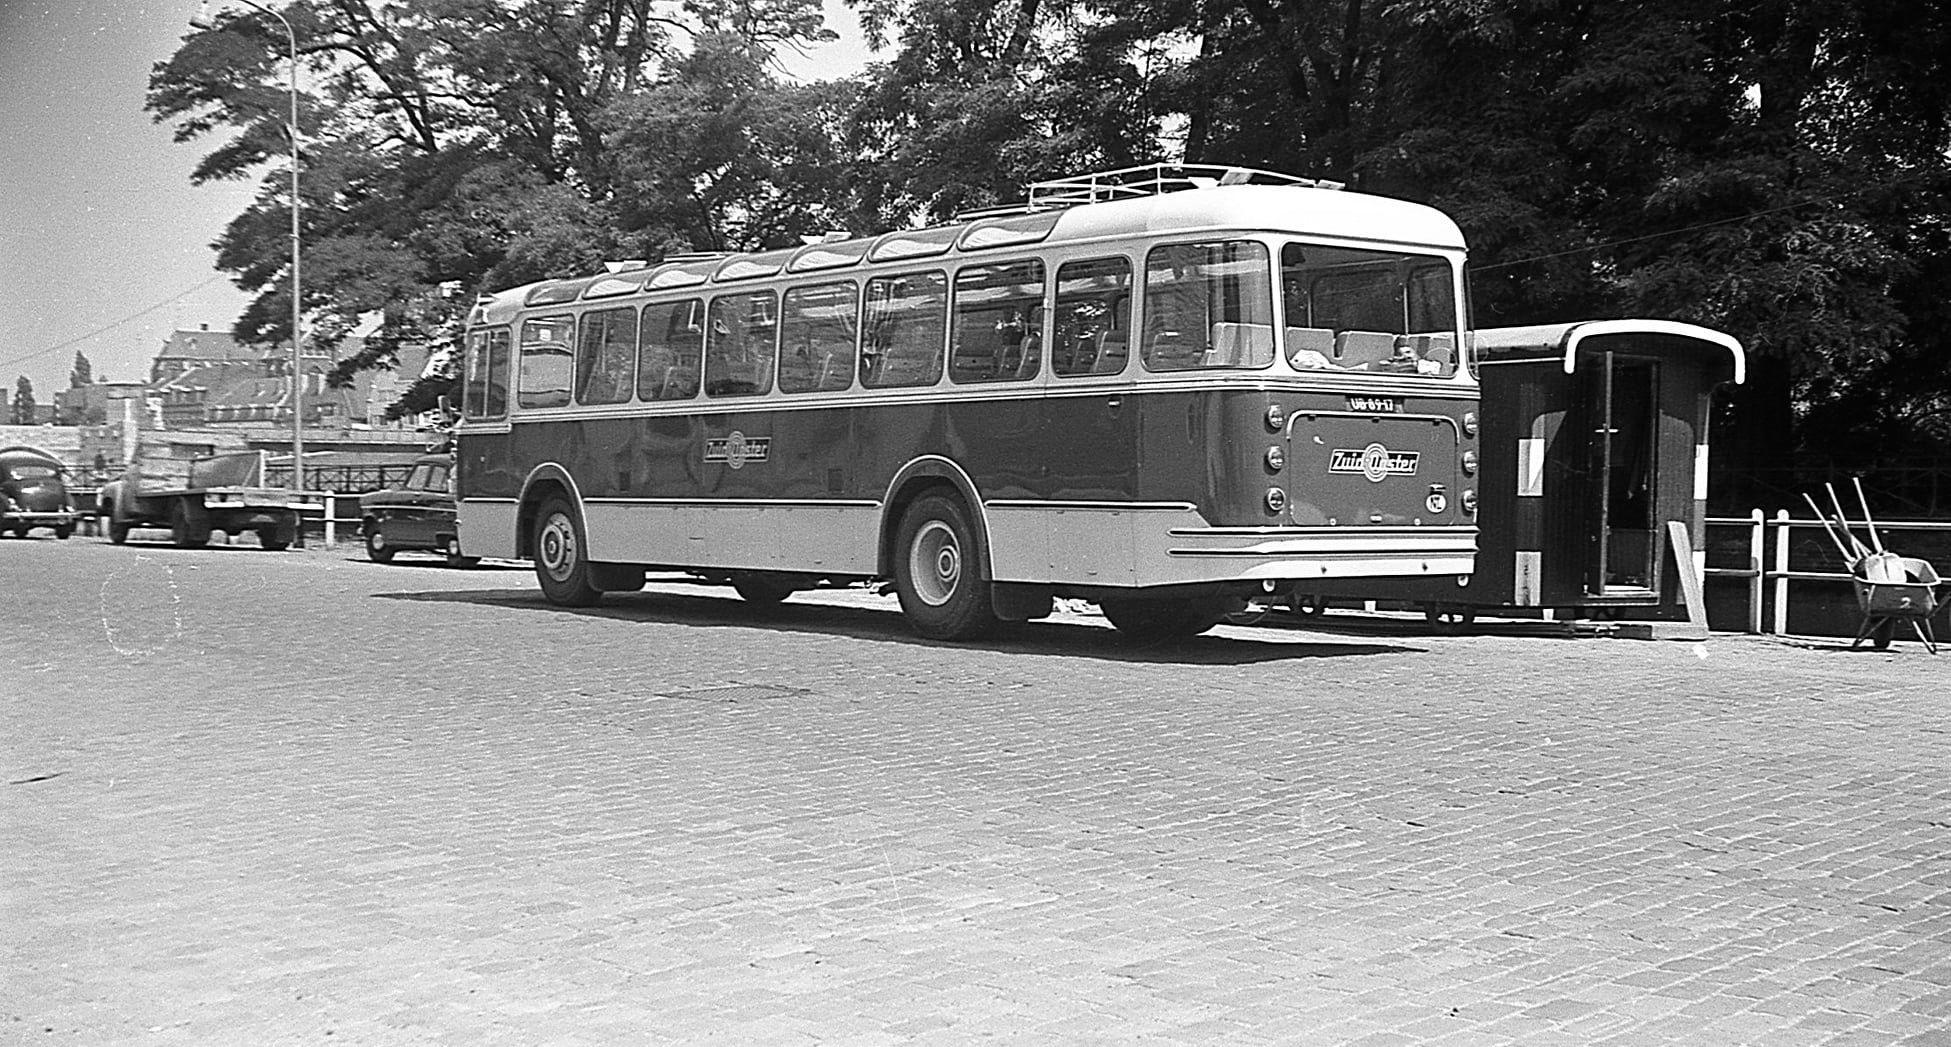 UB-88-17